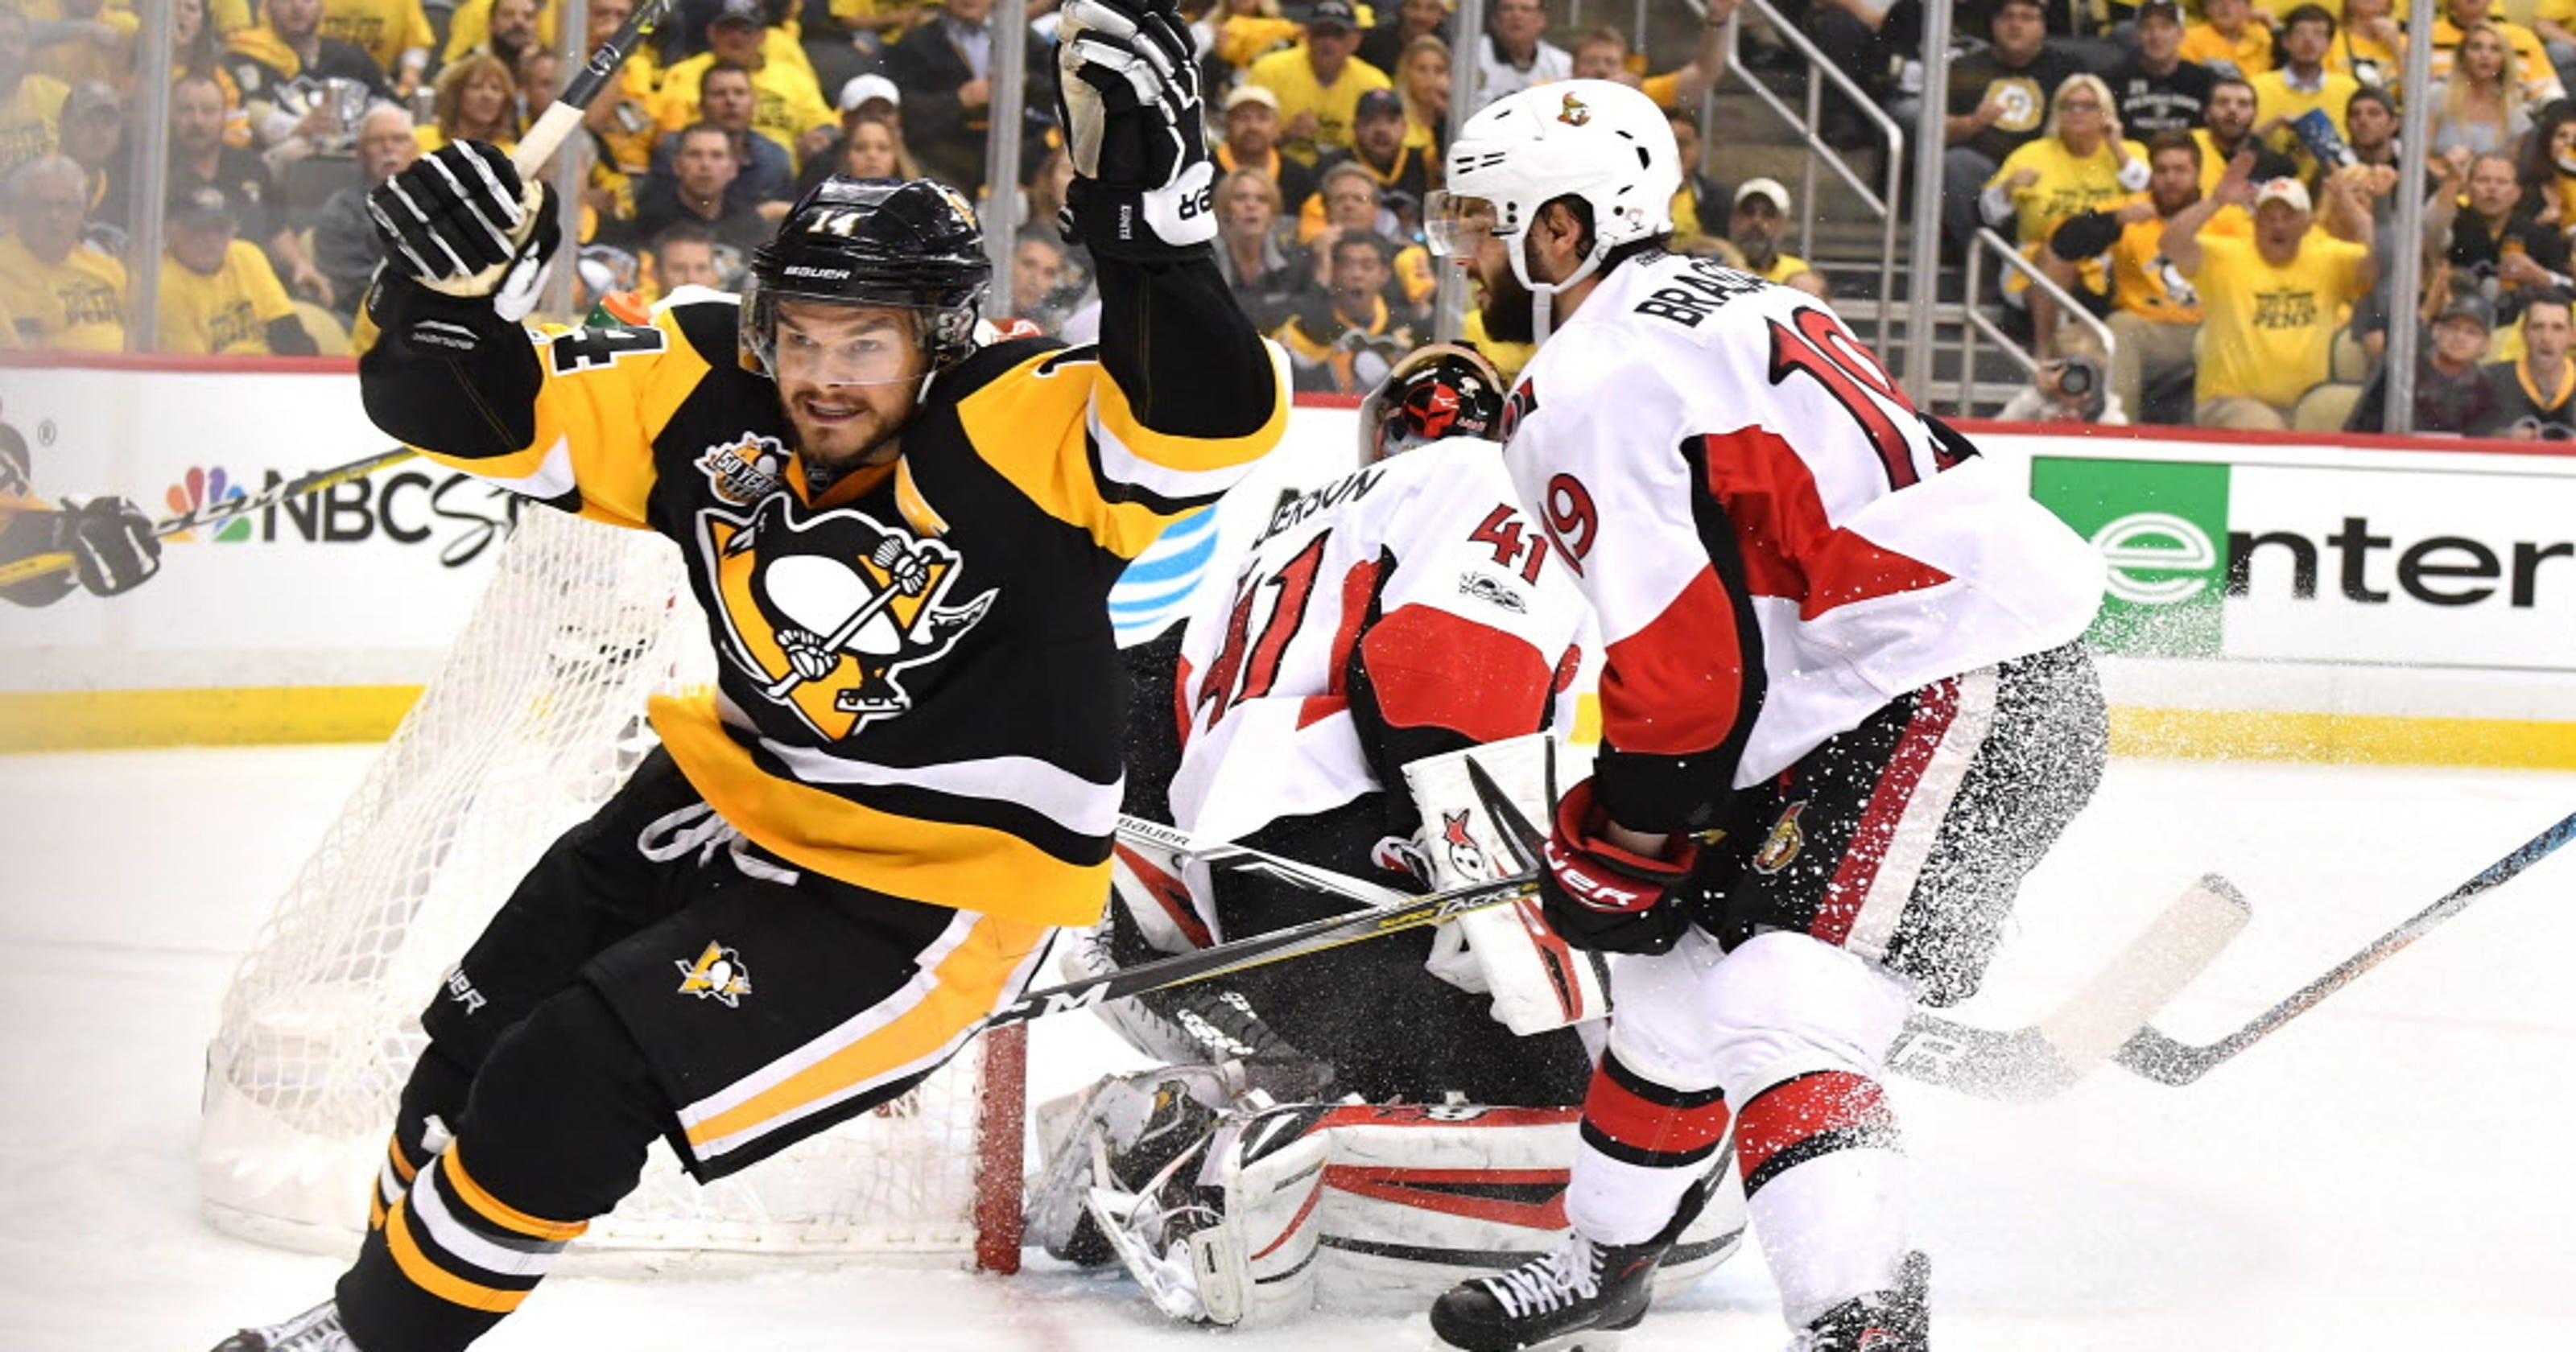 a2e84c20 Pittsburgh Penguins' Chris Kunitz caps 2OT Game 7 thriller